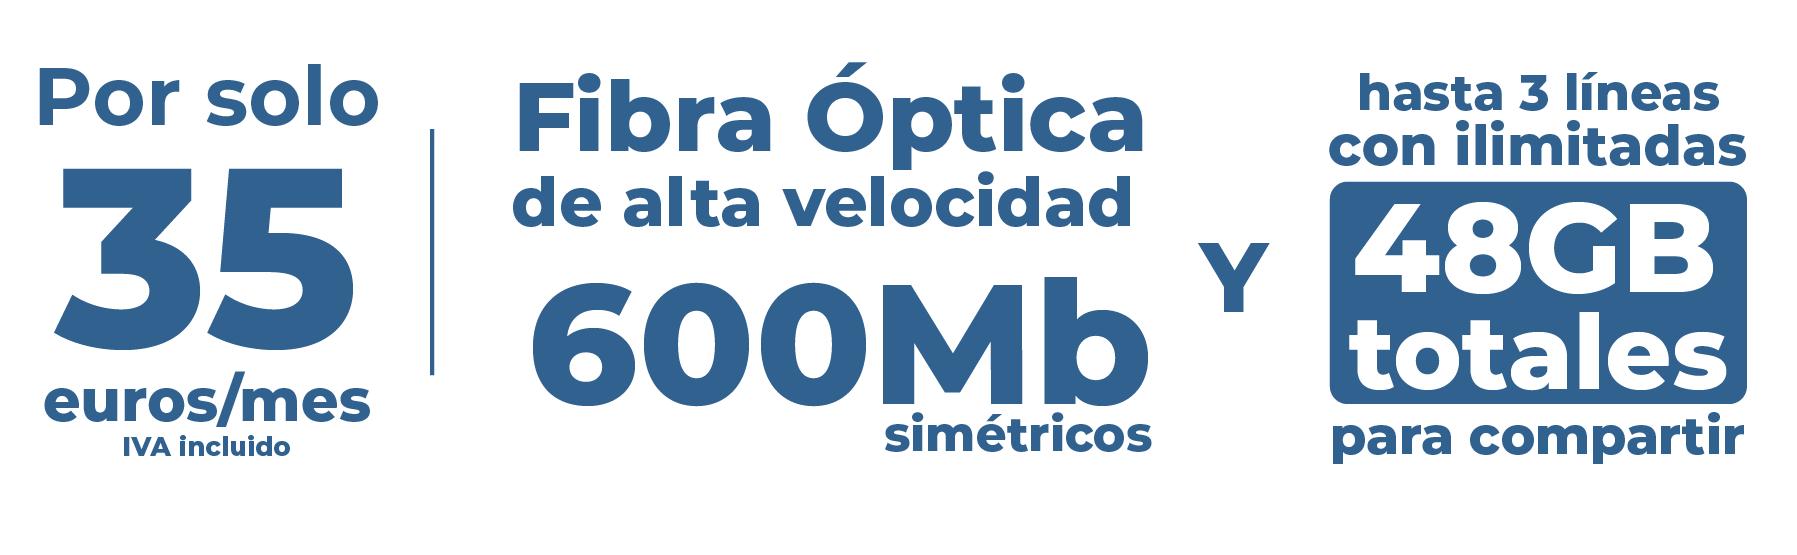 Avanza Fibra (Murcia) 600 Mbps Simétricos FTTH + 3 móviles con ilimitadas + 48GB